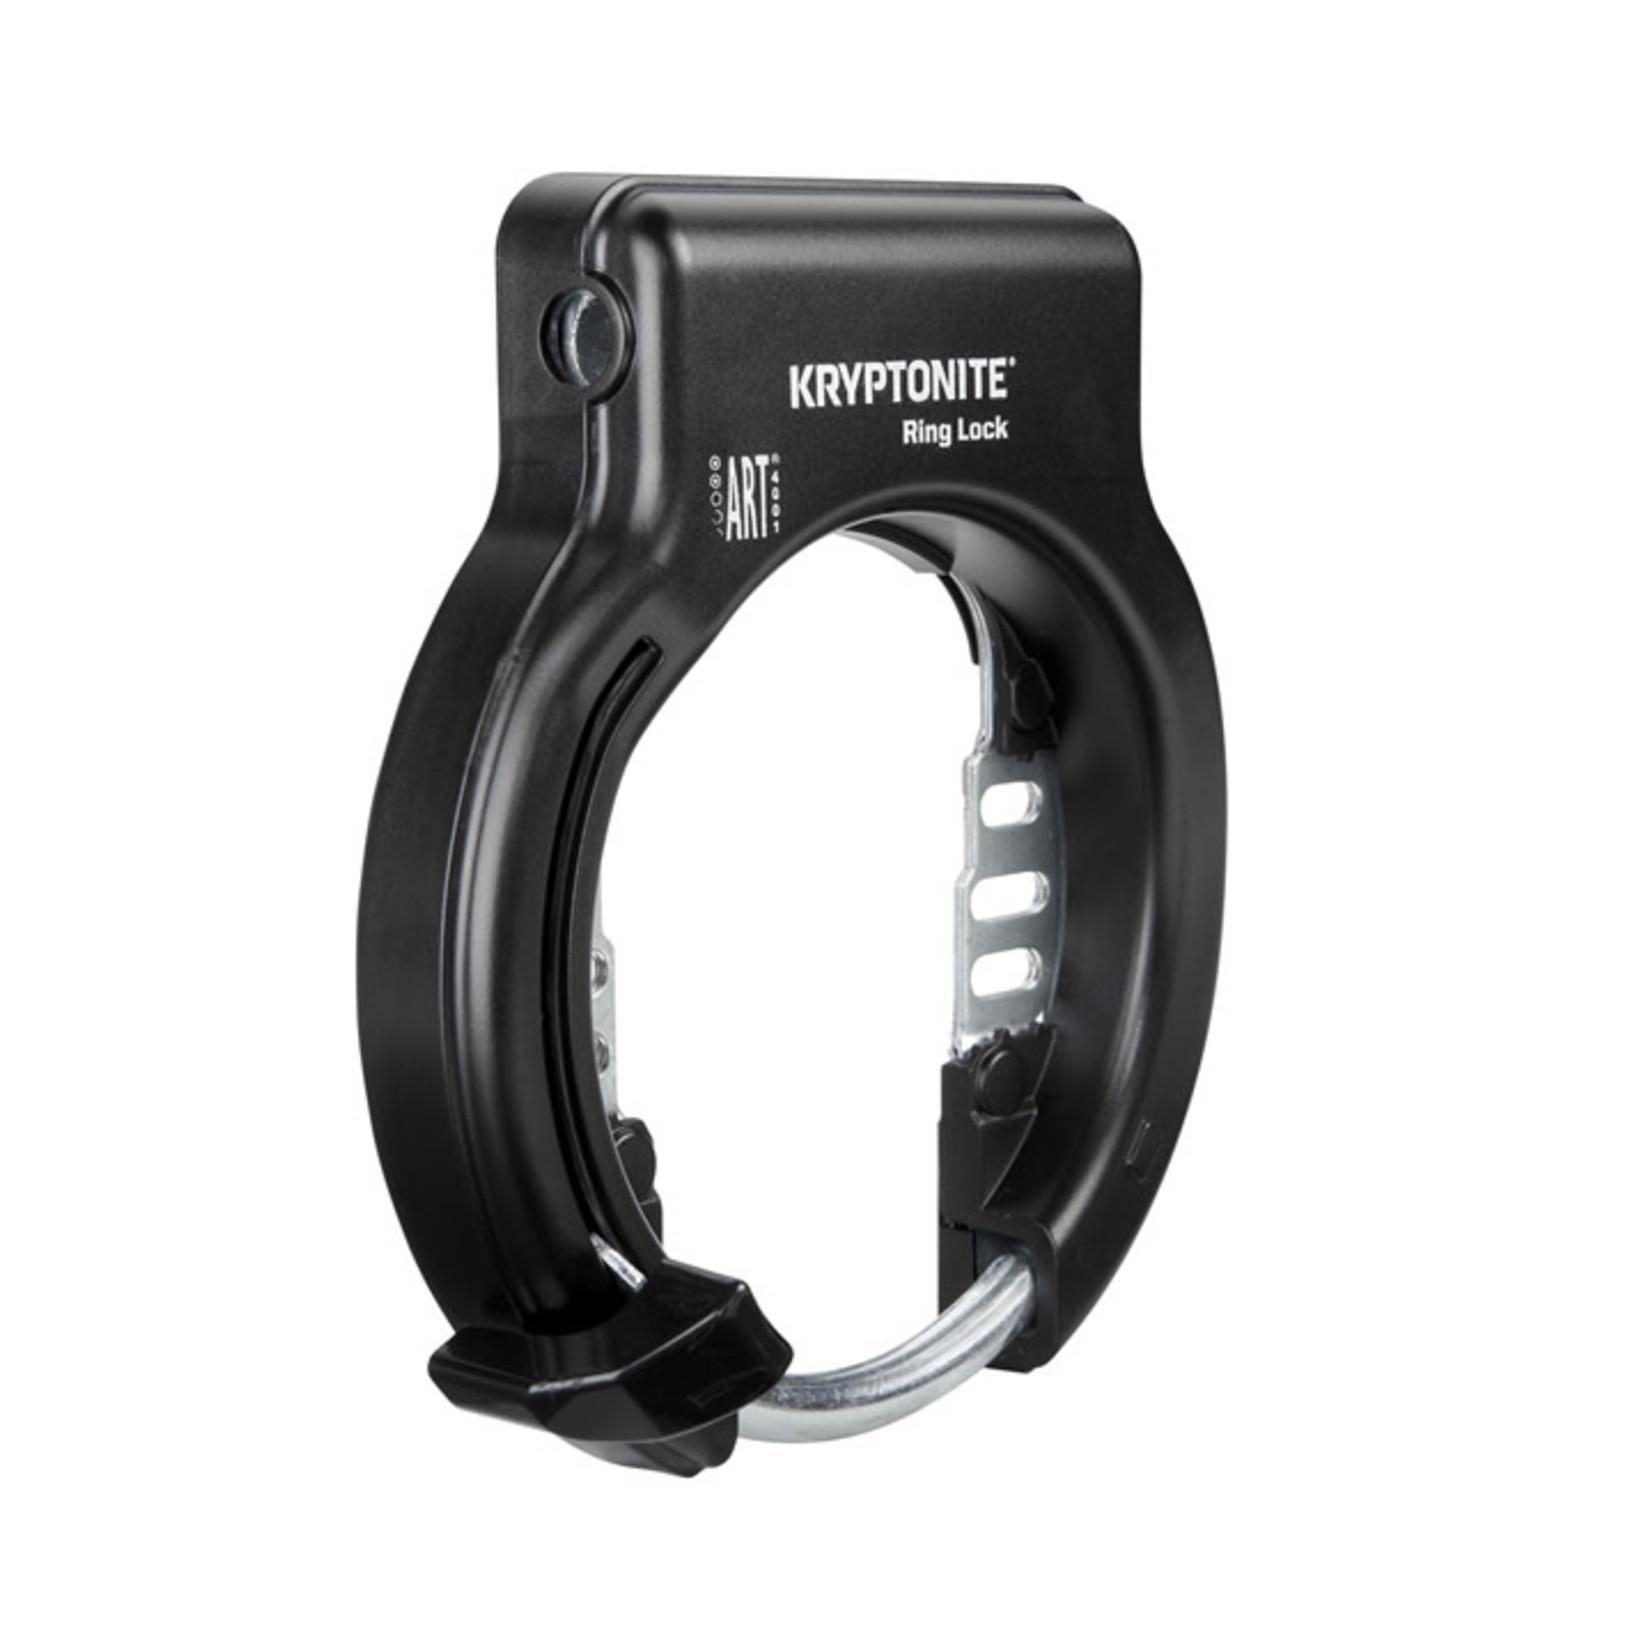 Kryptonite Ring Lock with Flex Mount